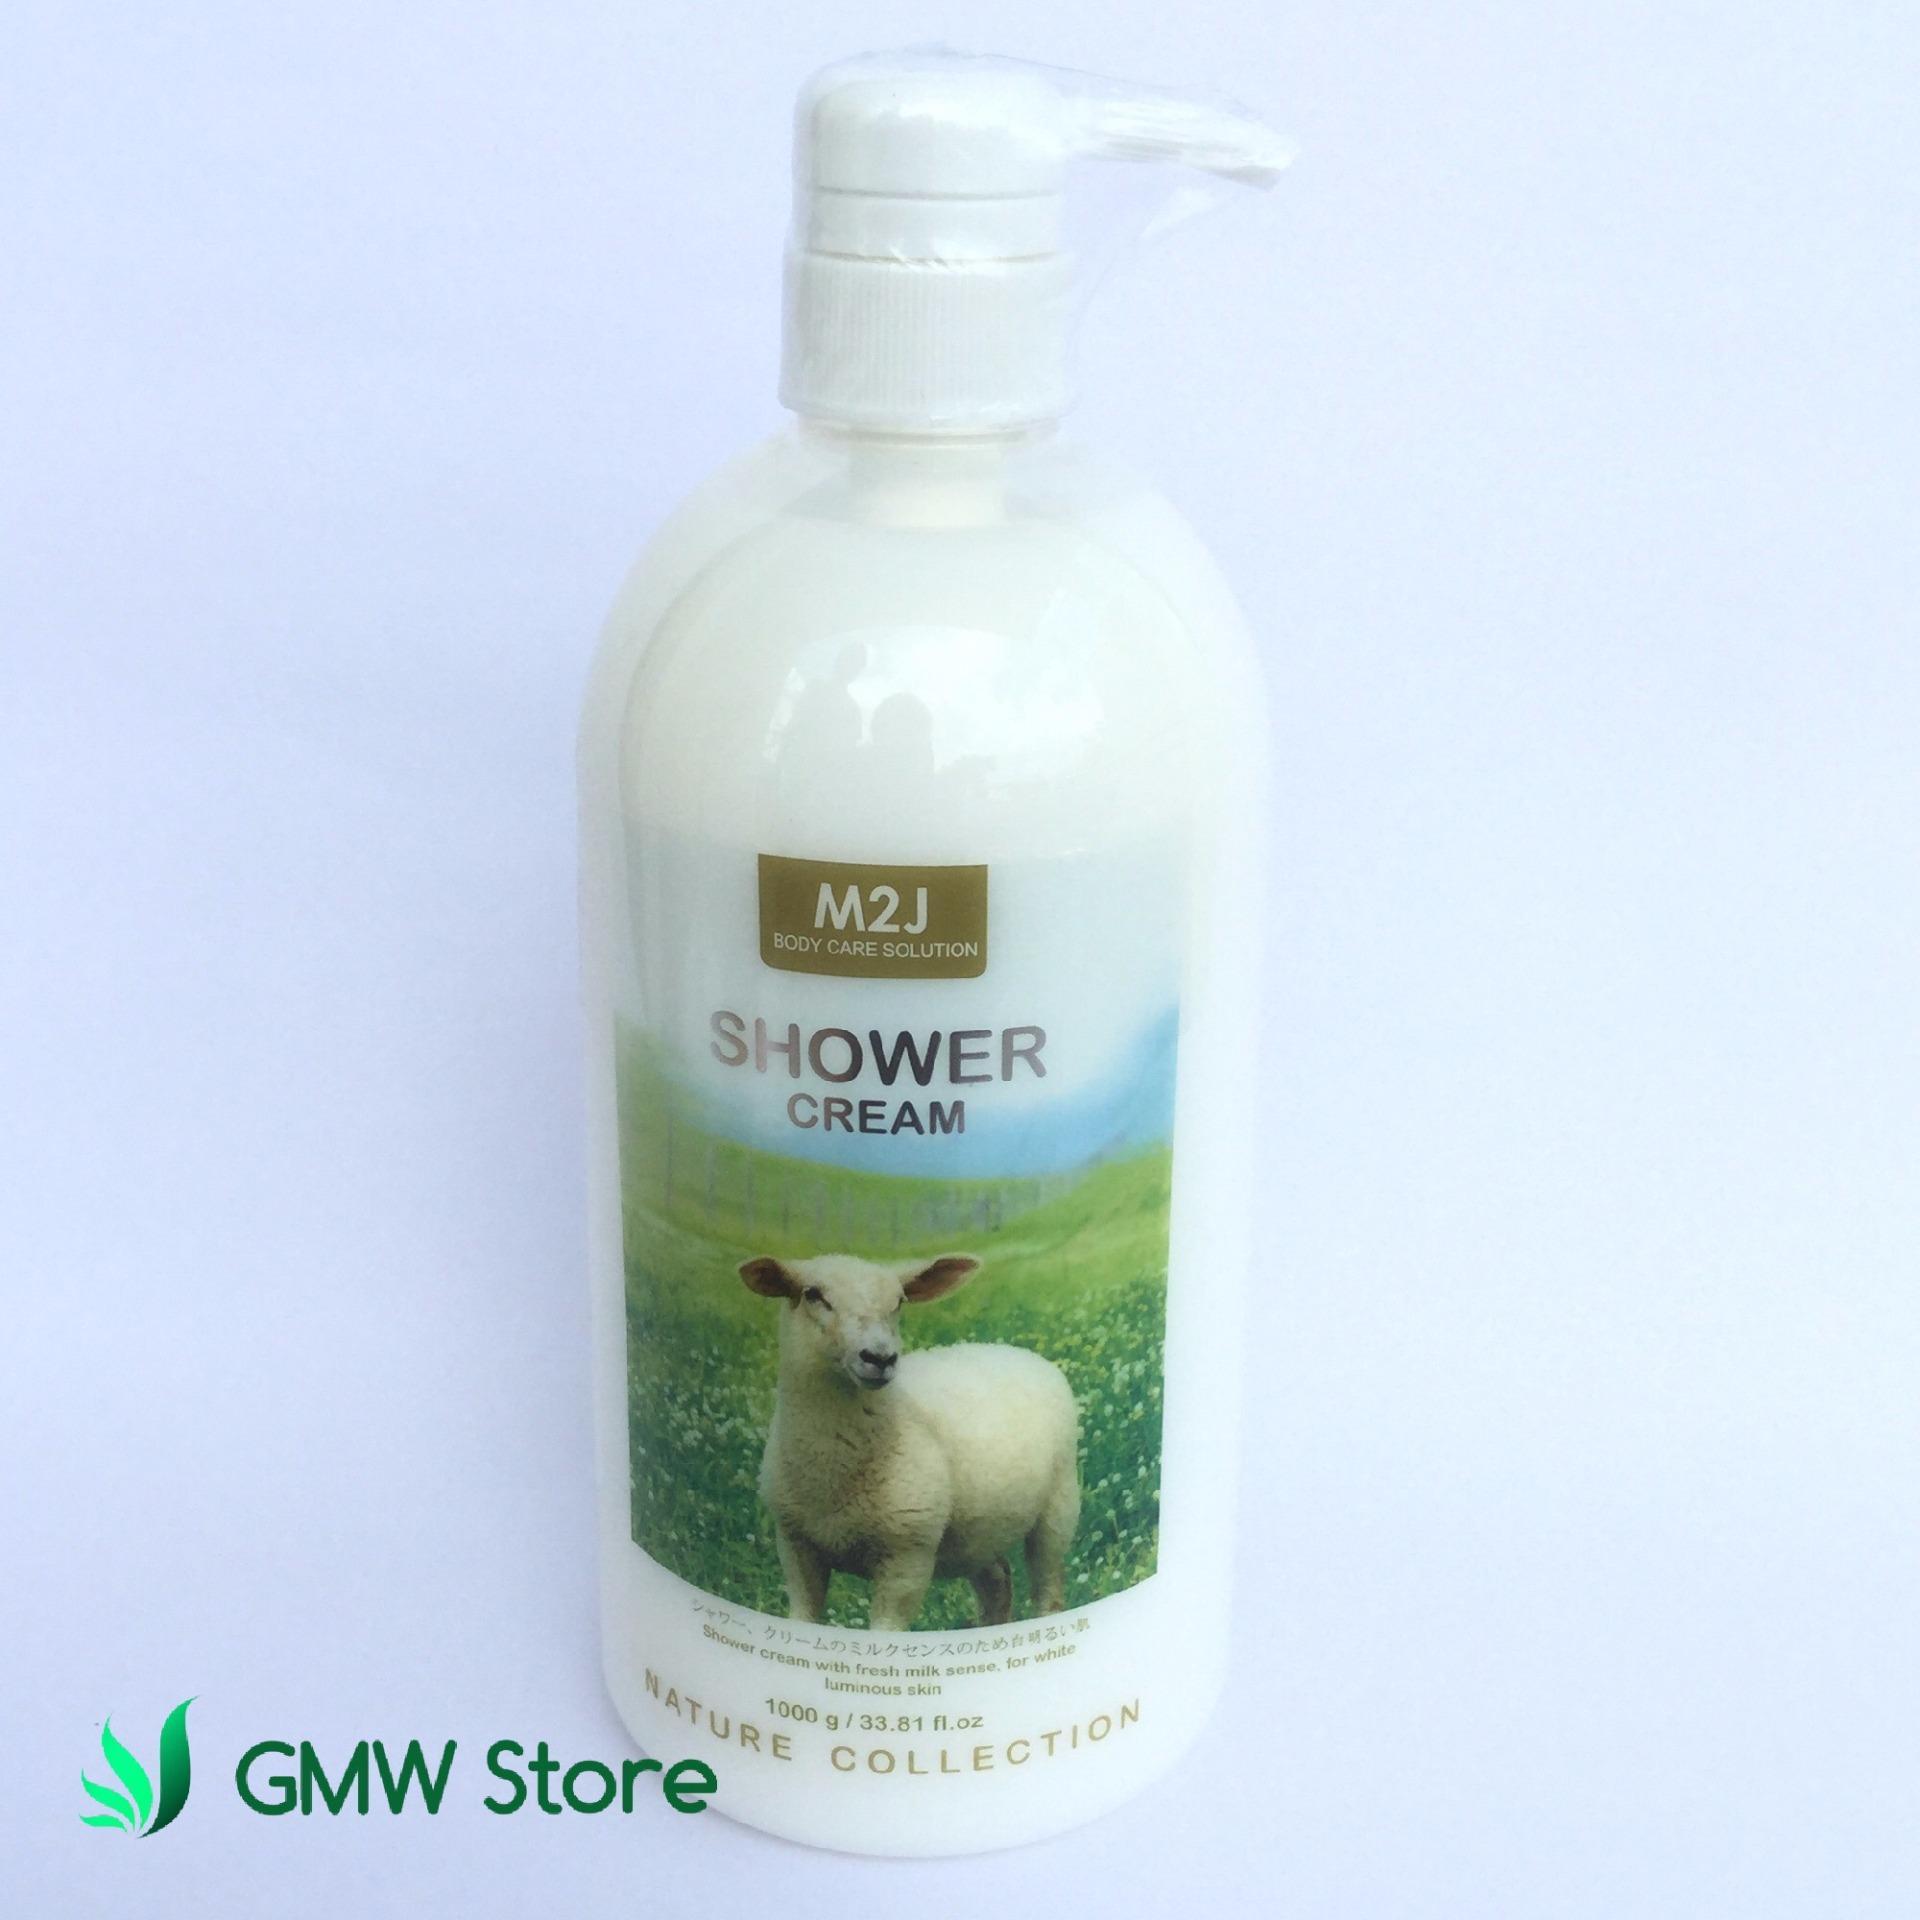 M2J Shower Cream Pump 1000gr